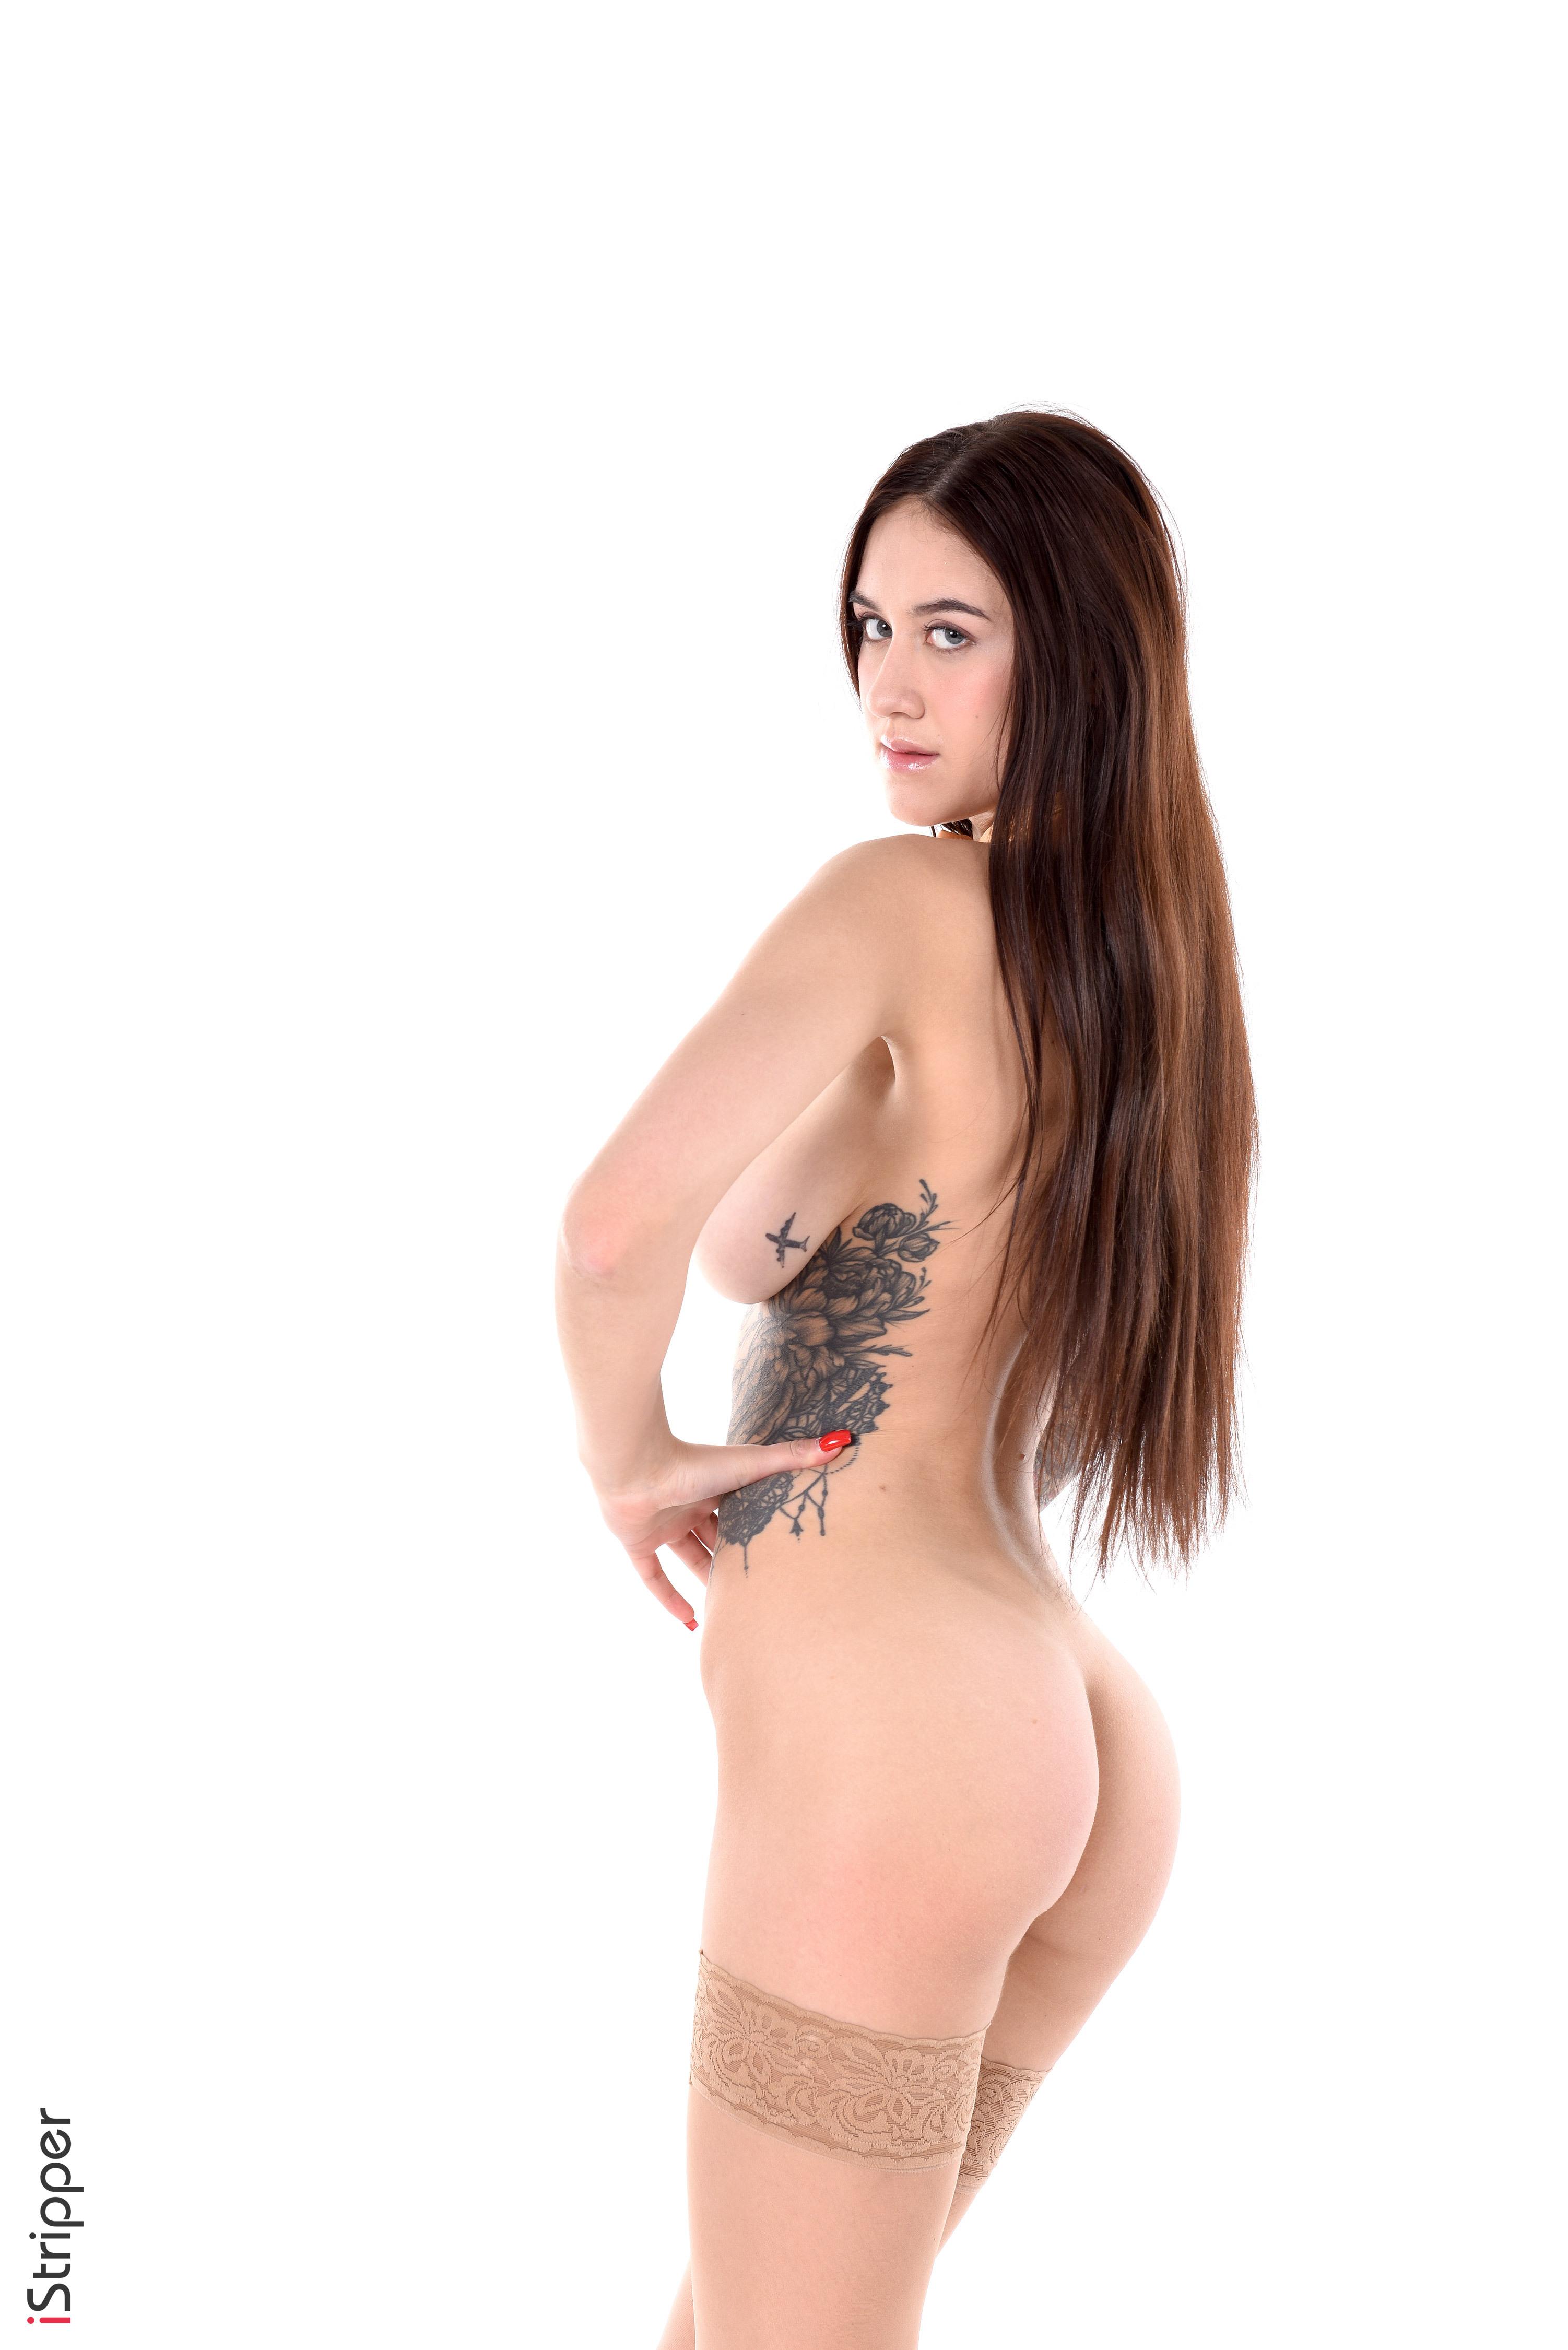 wallpaper sexi girl